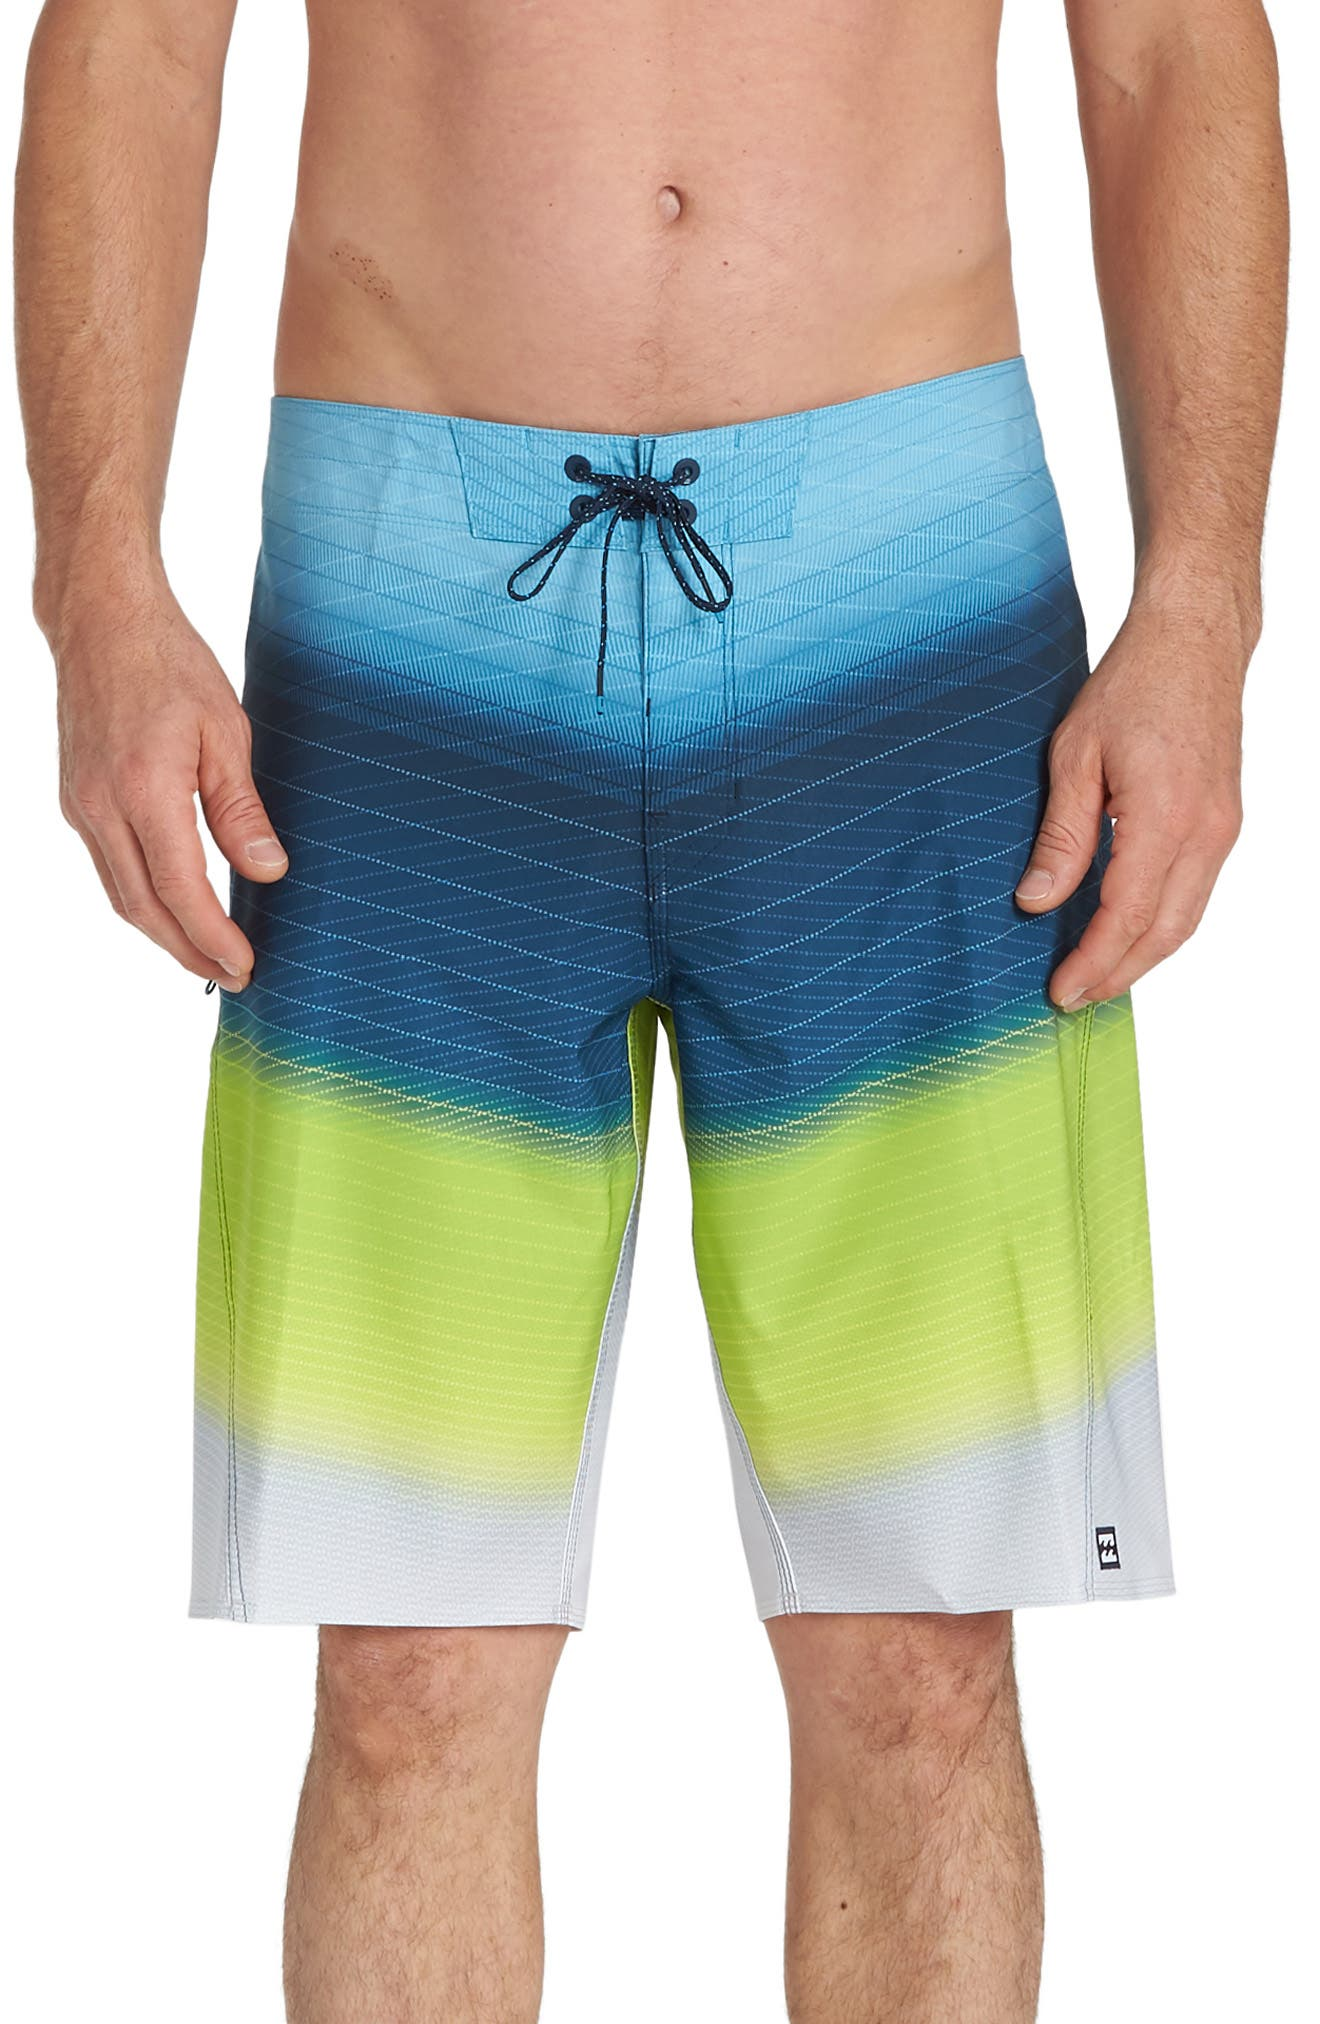 Billabong Fluid Pro Board Shorts, Green